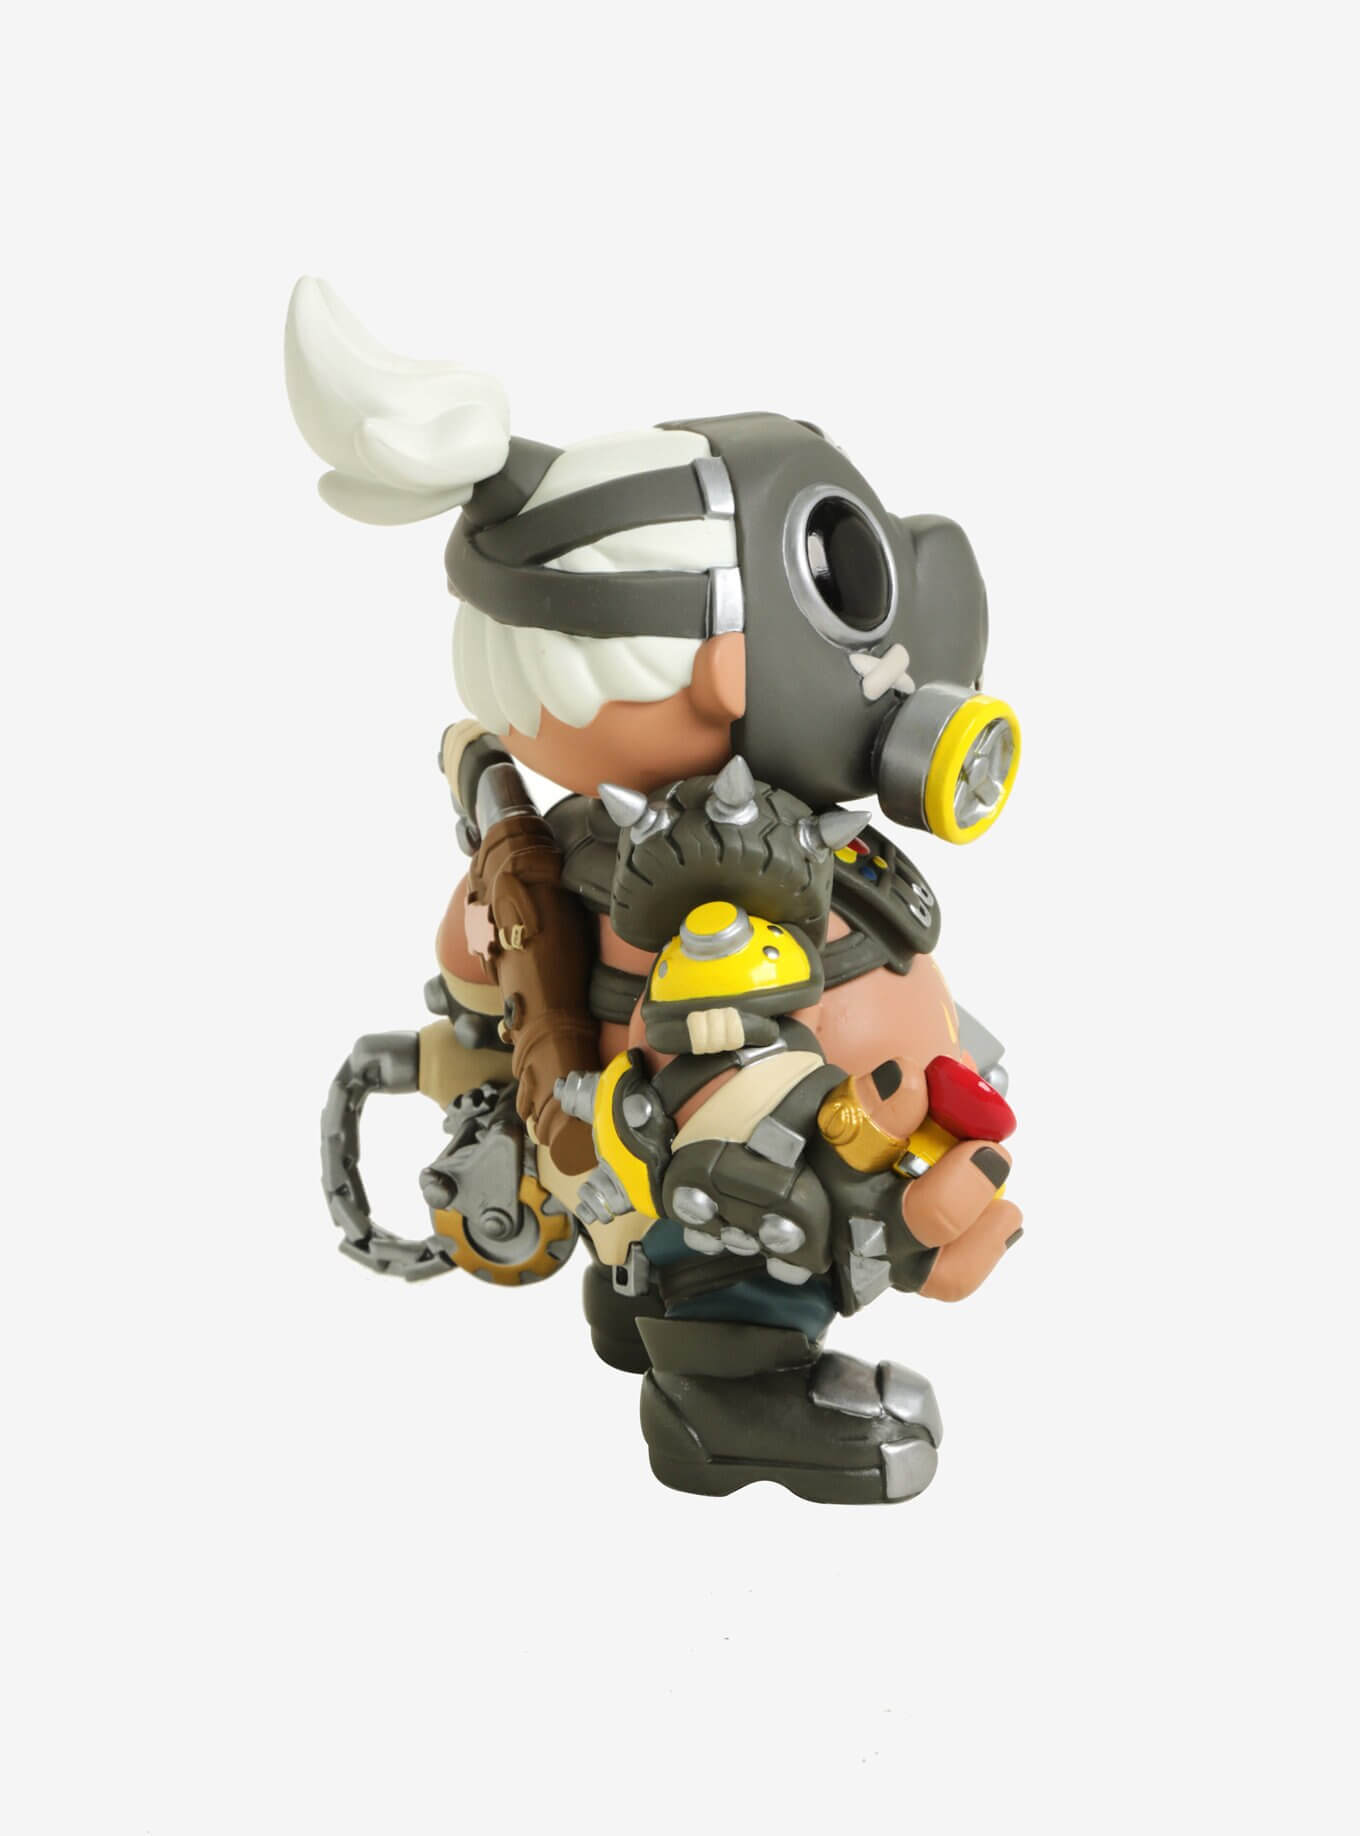 Roadhog #309 - Overwatch - Funko Pop! Games